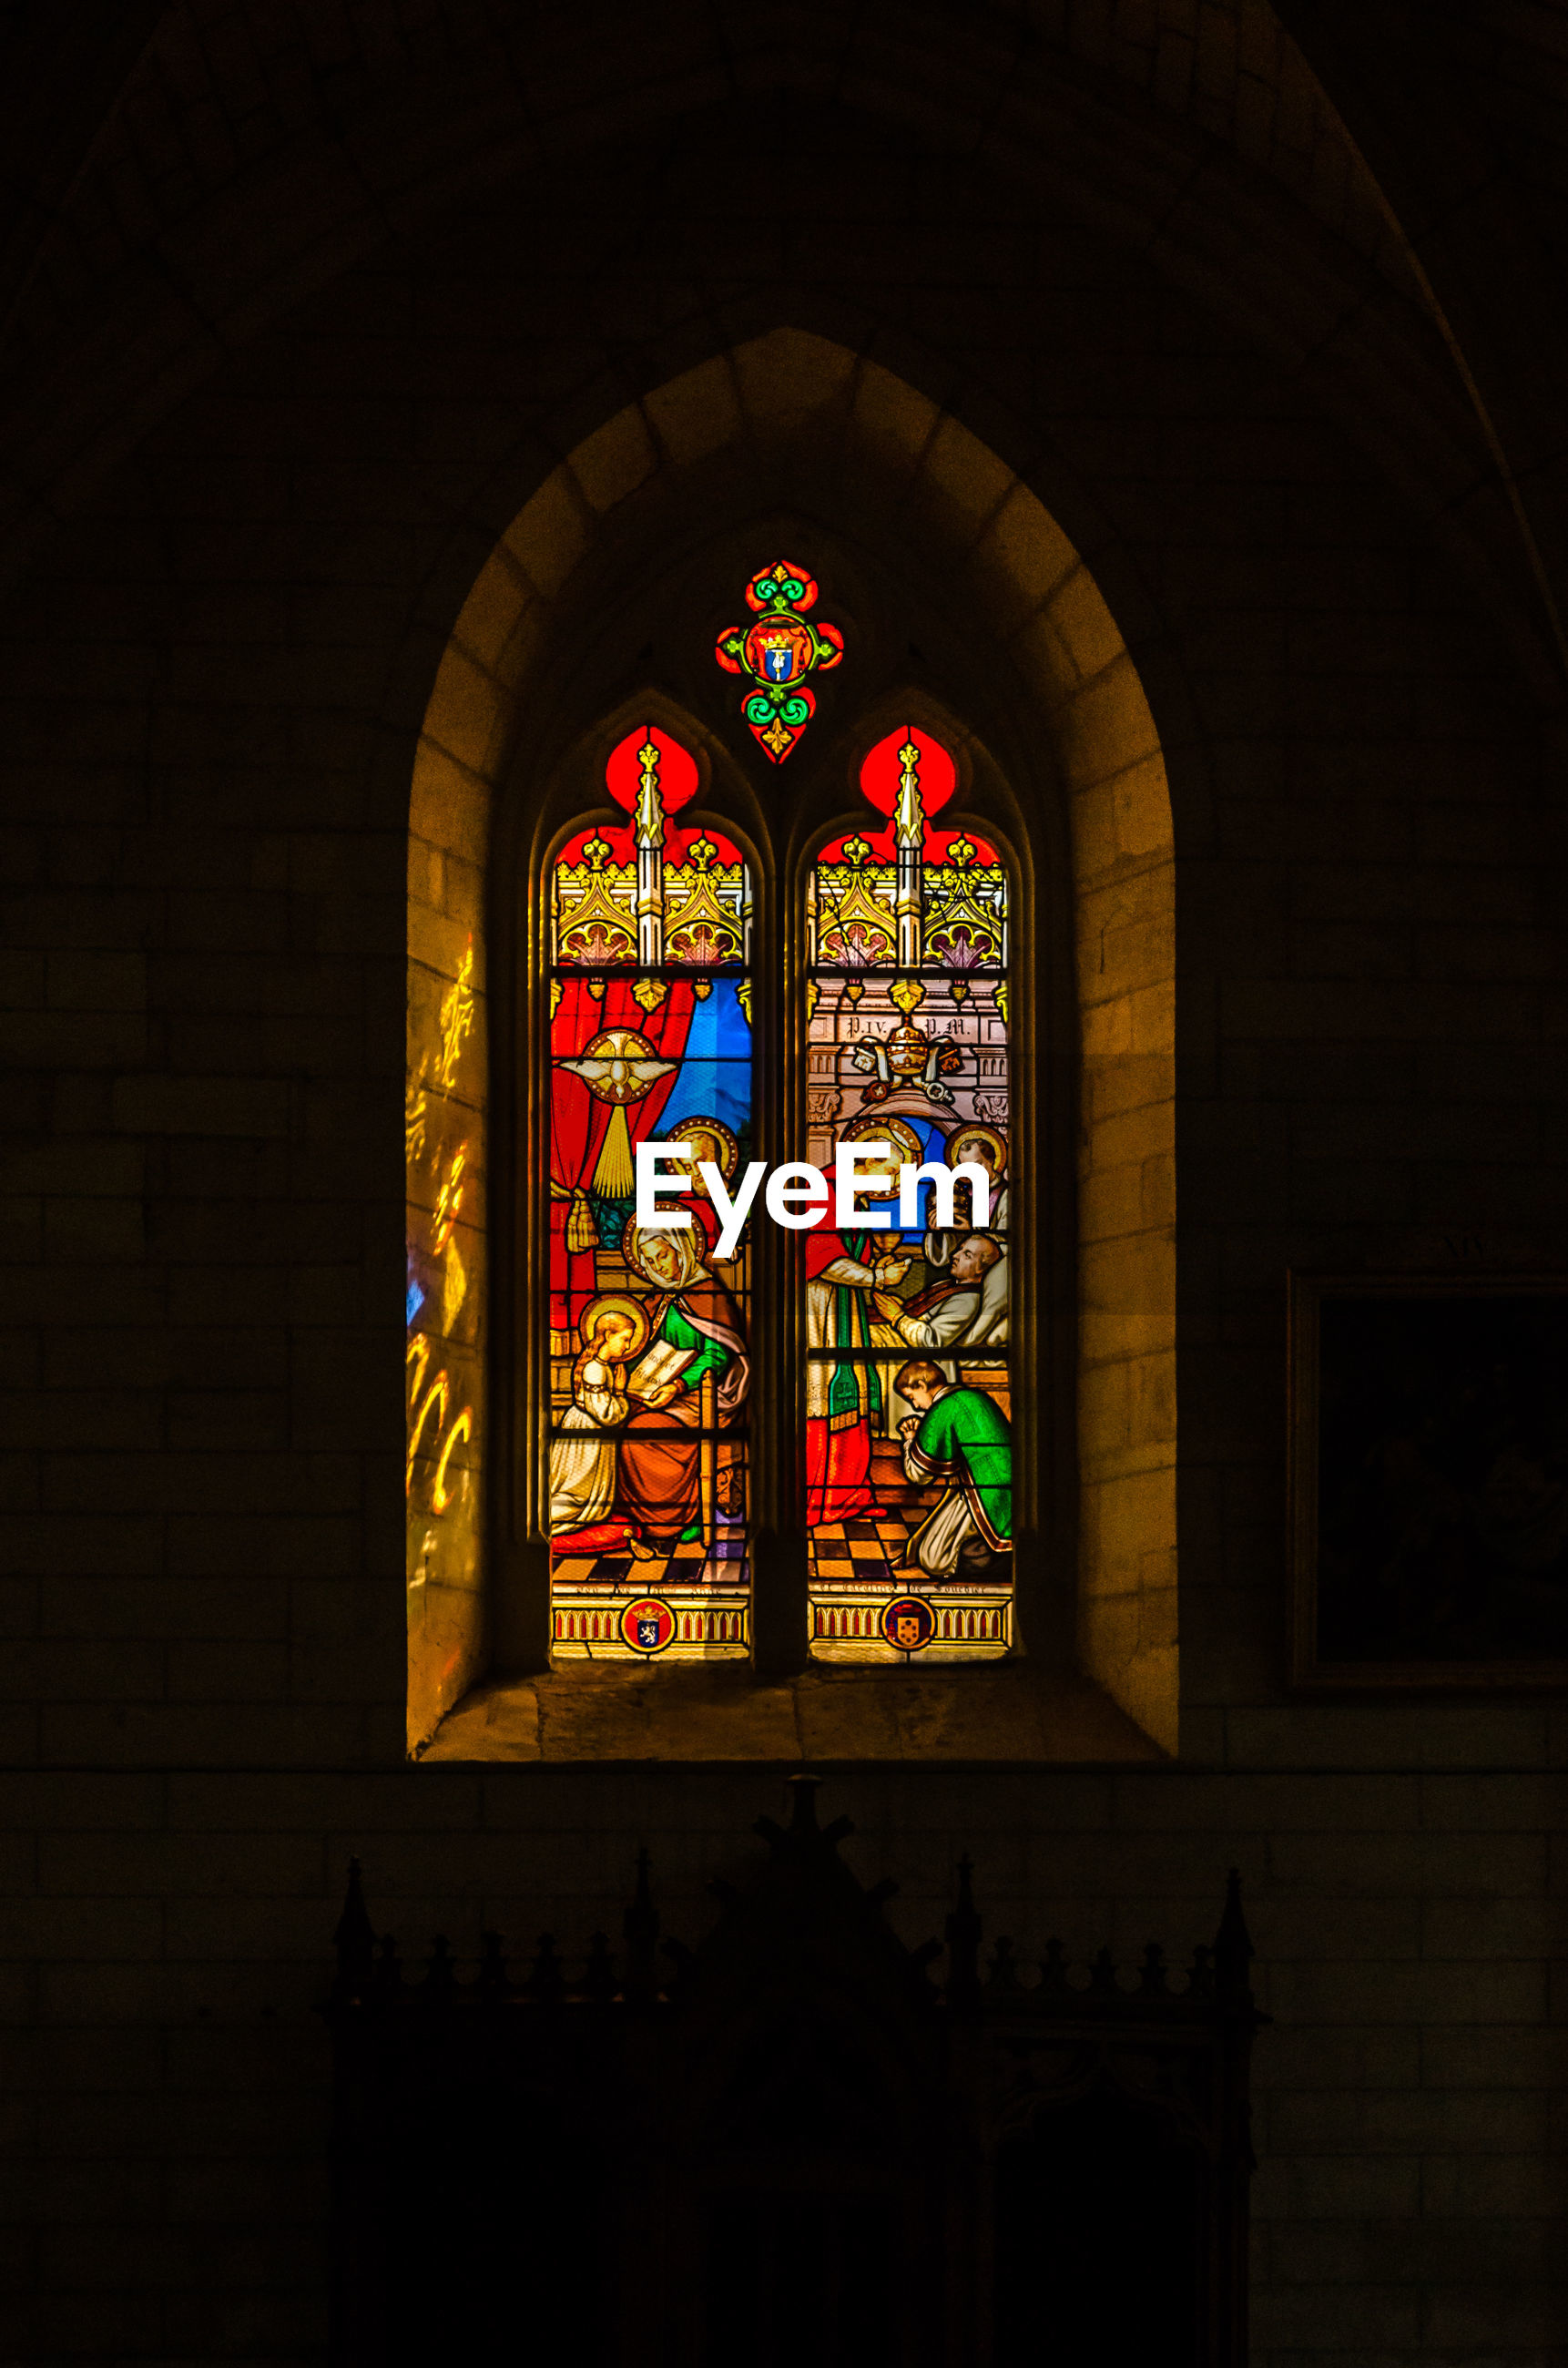 COLORFUL WINDOW IN CHURCH